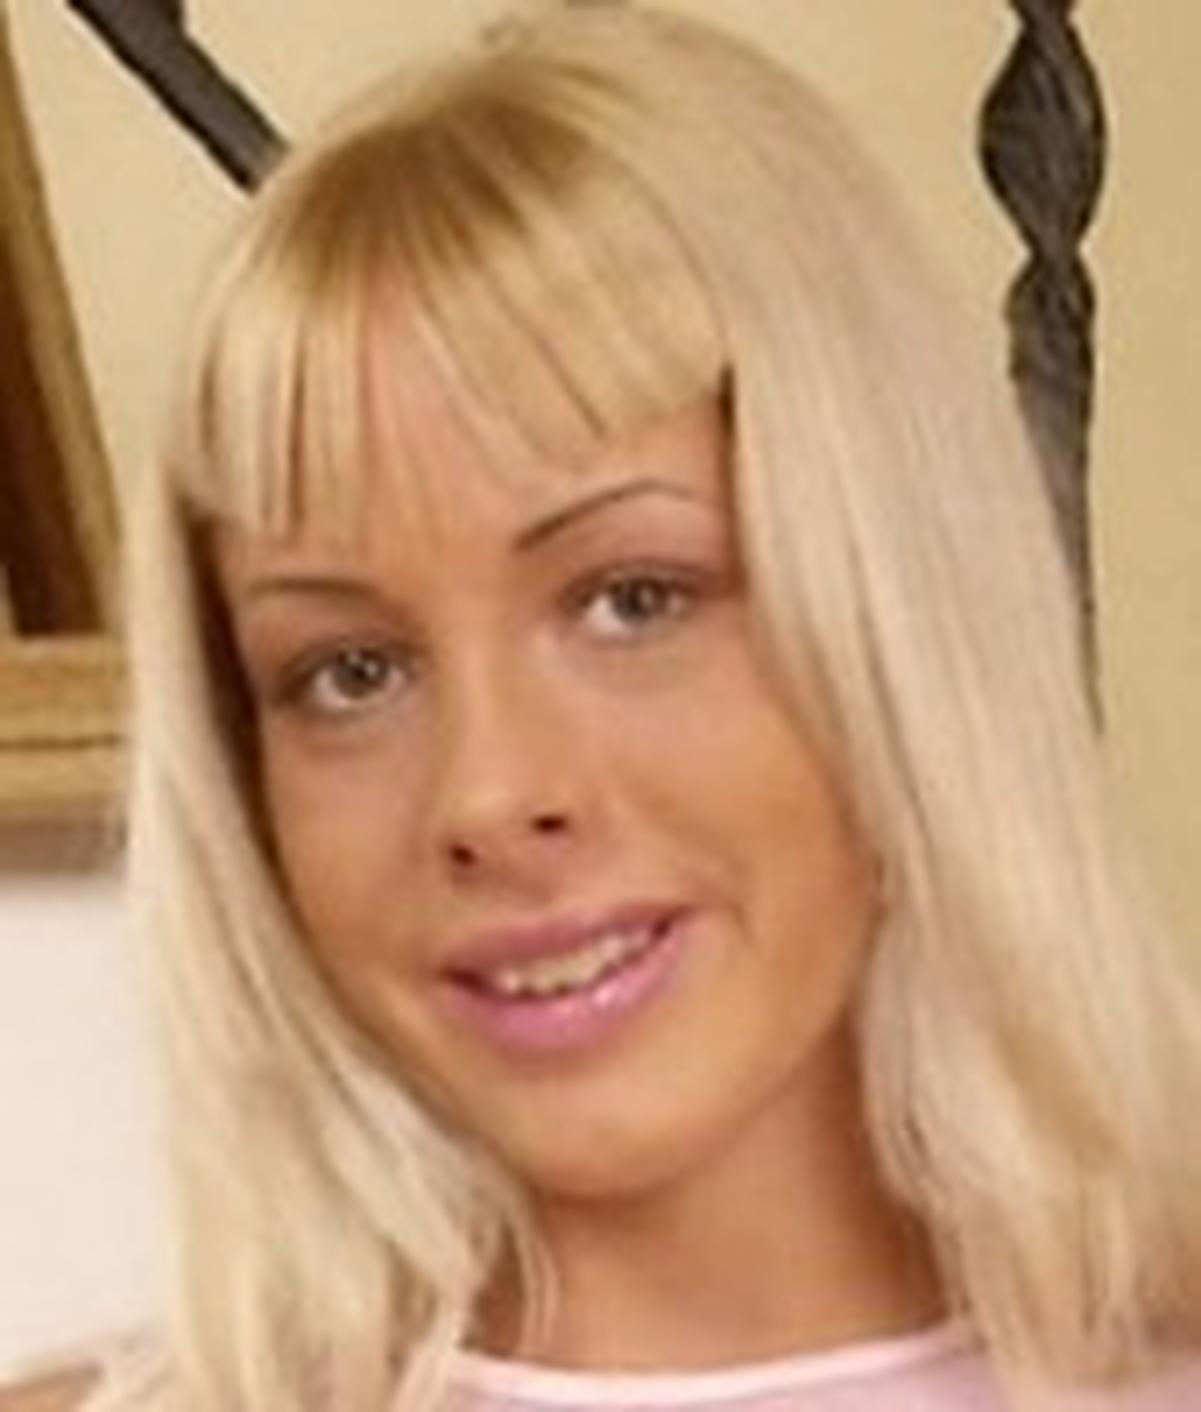 Megan cole actriz porno wikipedia Megan Cole Wiki Bio